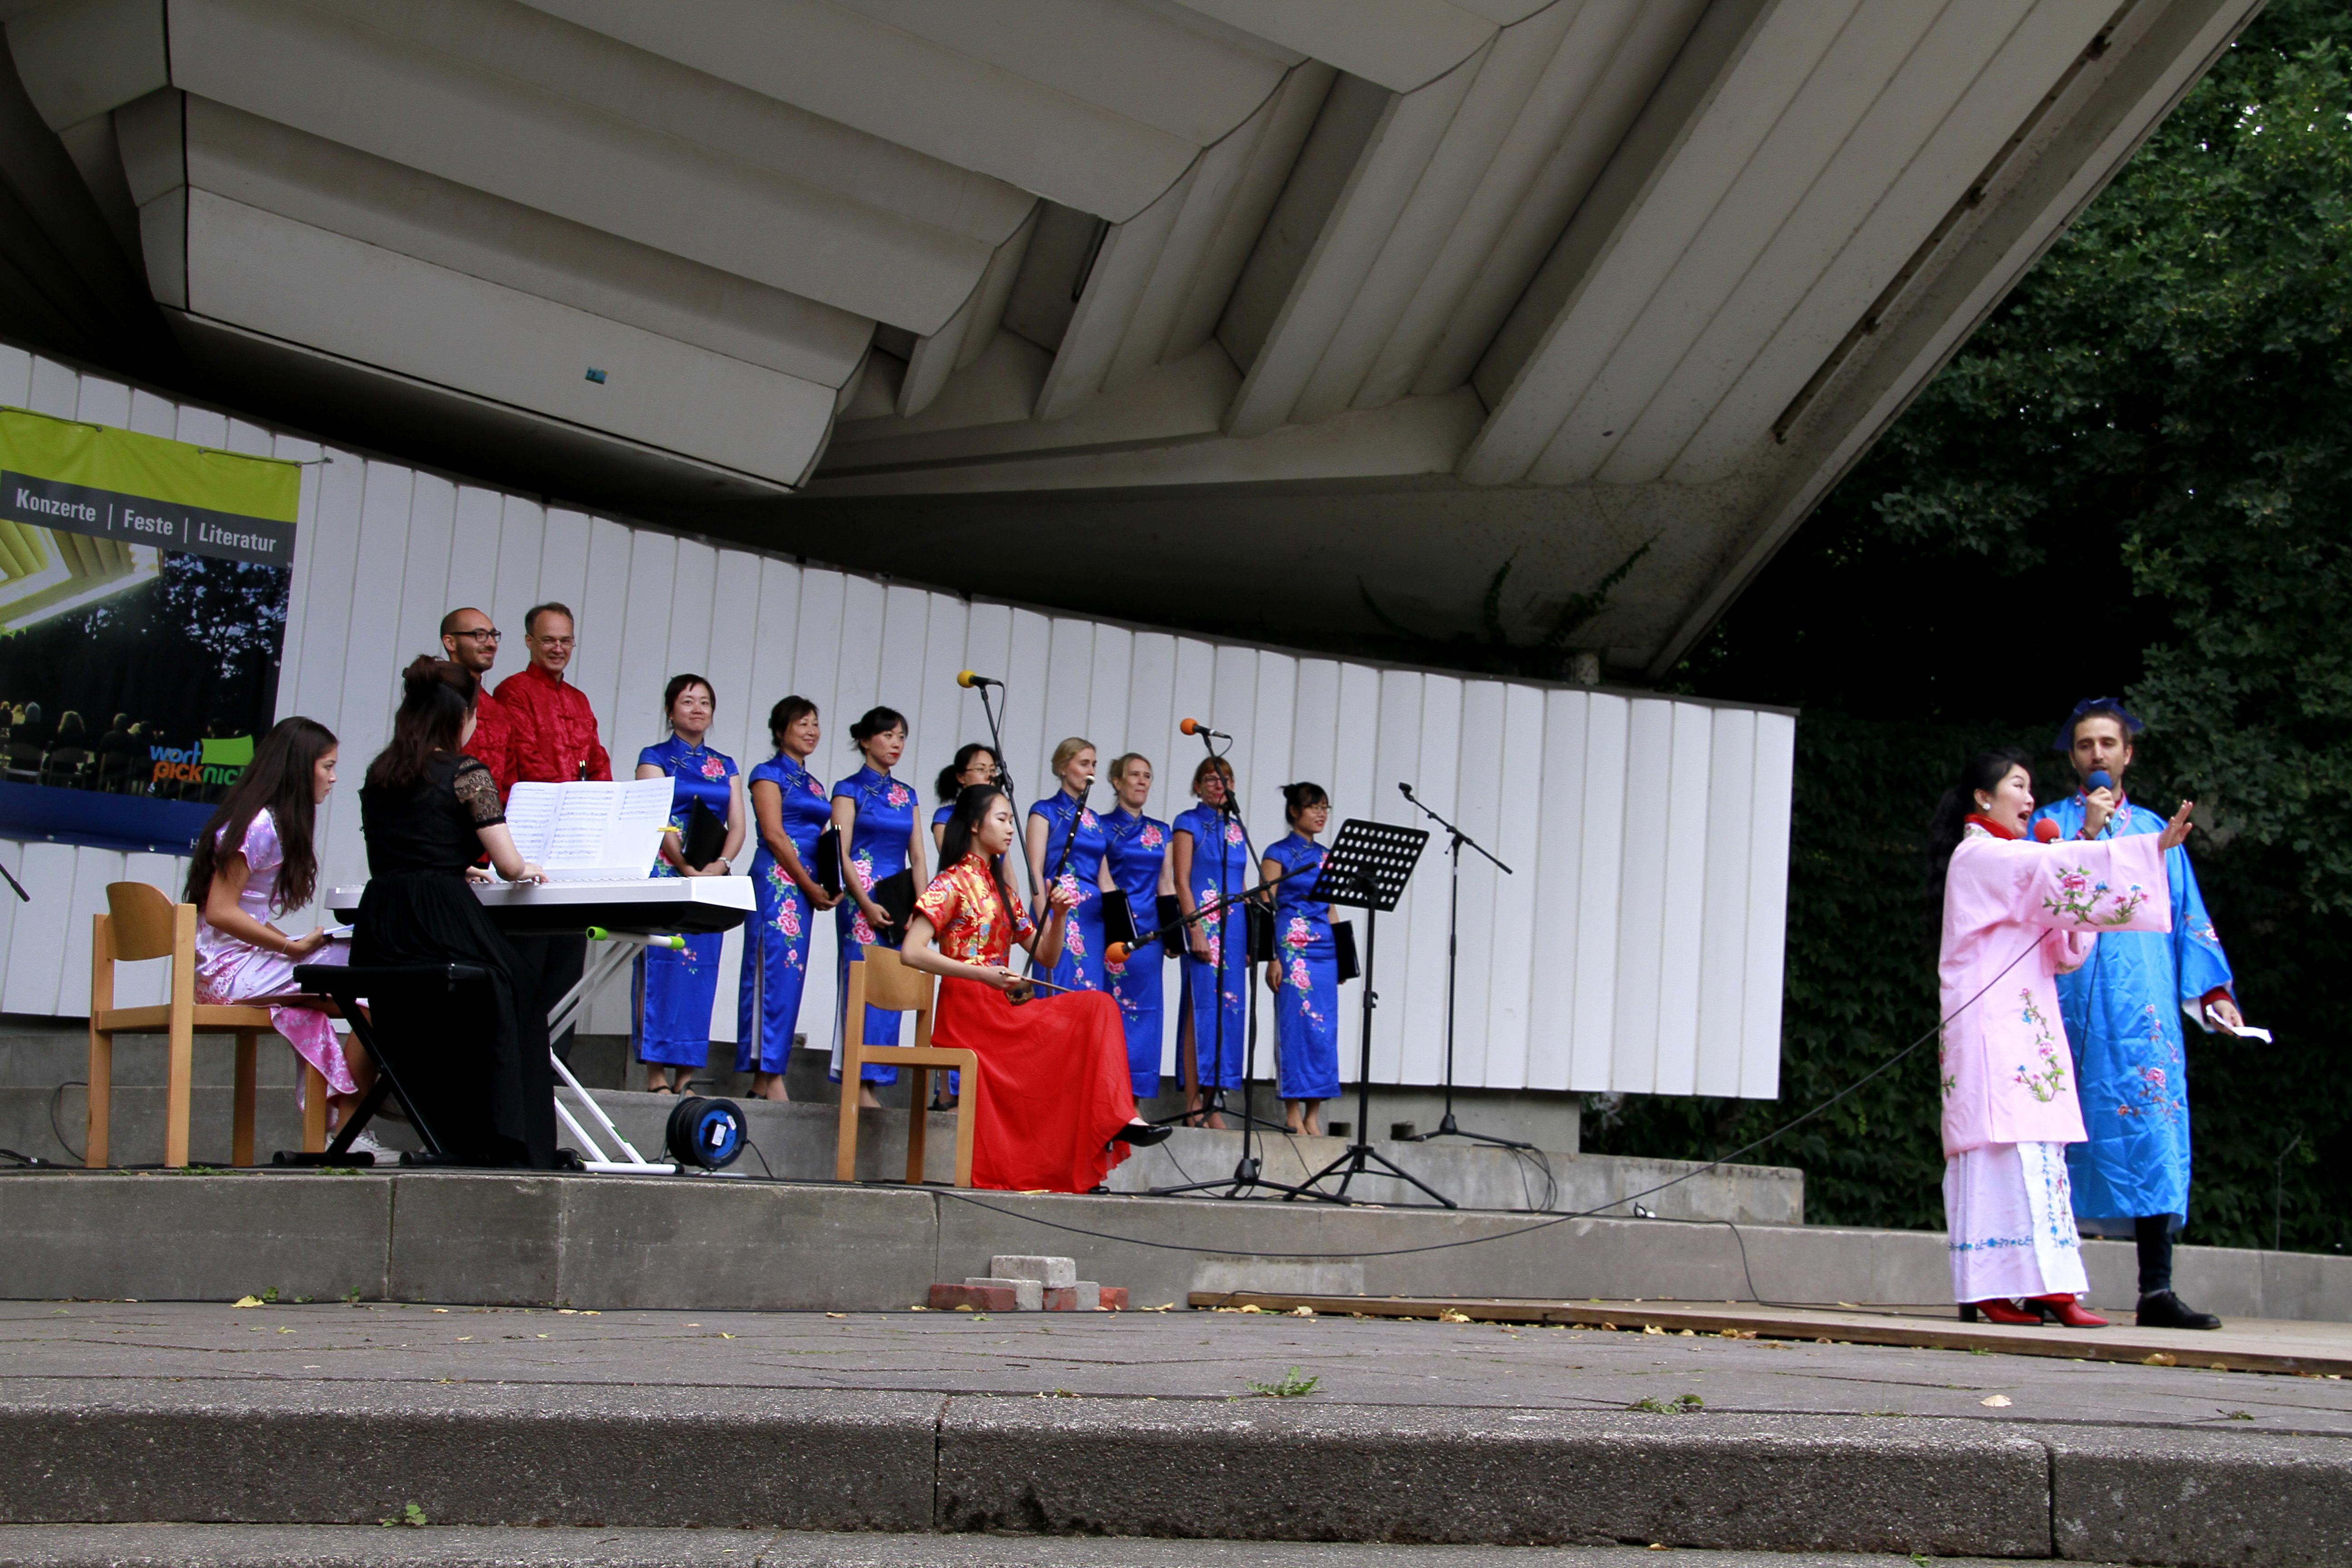 180826_Vocal_Colours_Chorfestival_50_Chinesischer_Chor